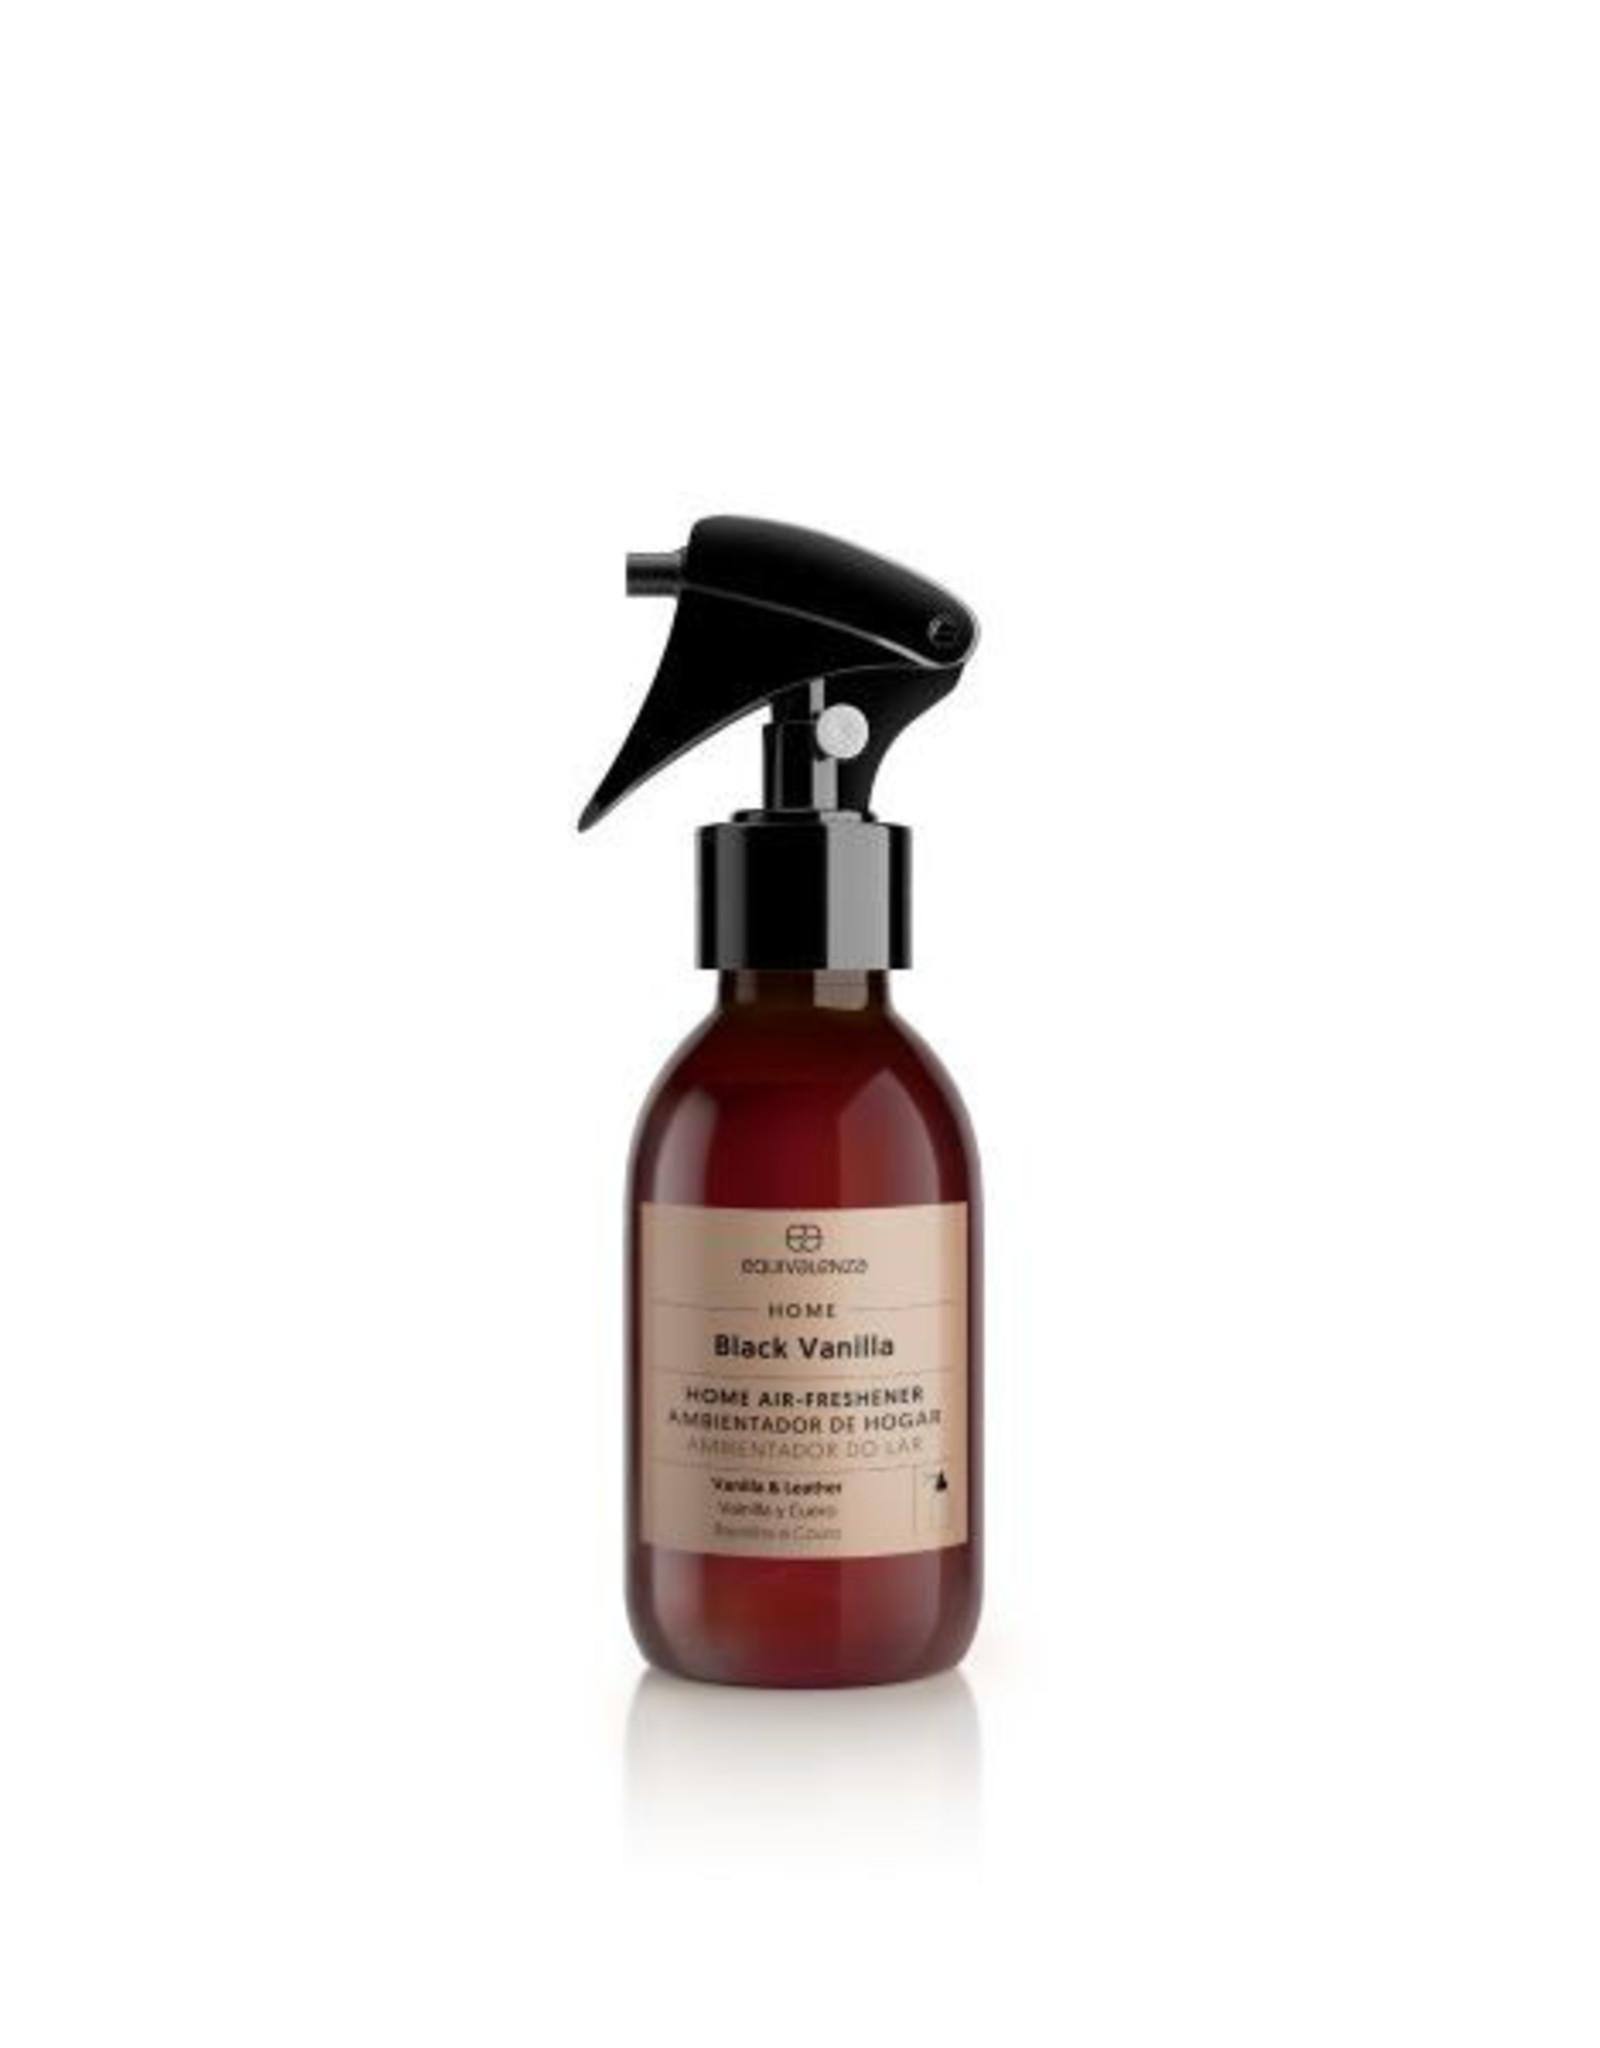 Equivalenza Air Freshener - Black Vanilla (black vanilla and leather)